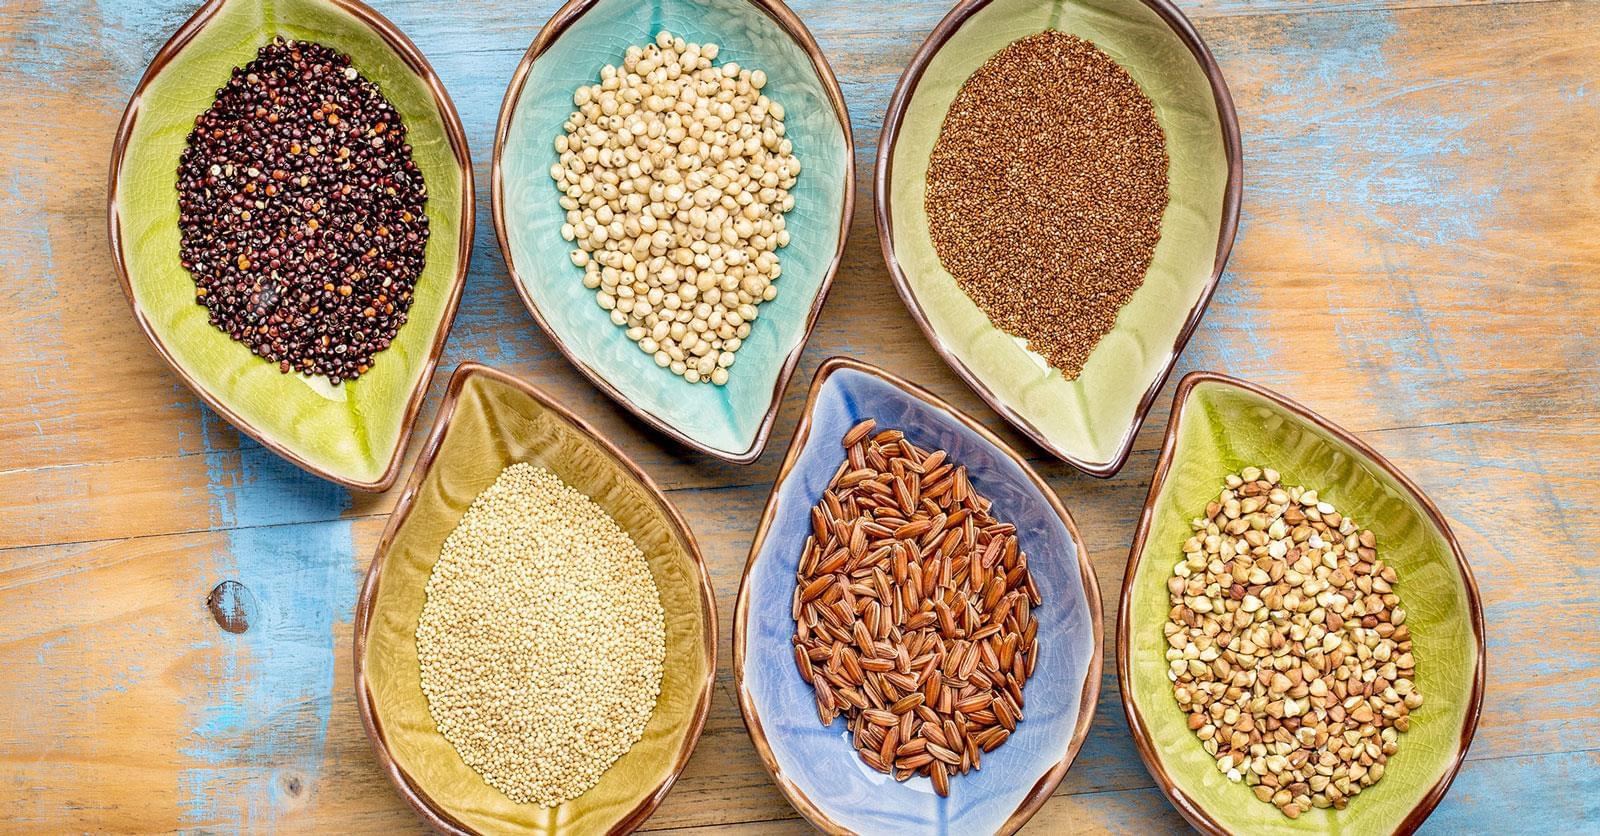 dieta senza farina e zucchero